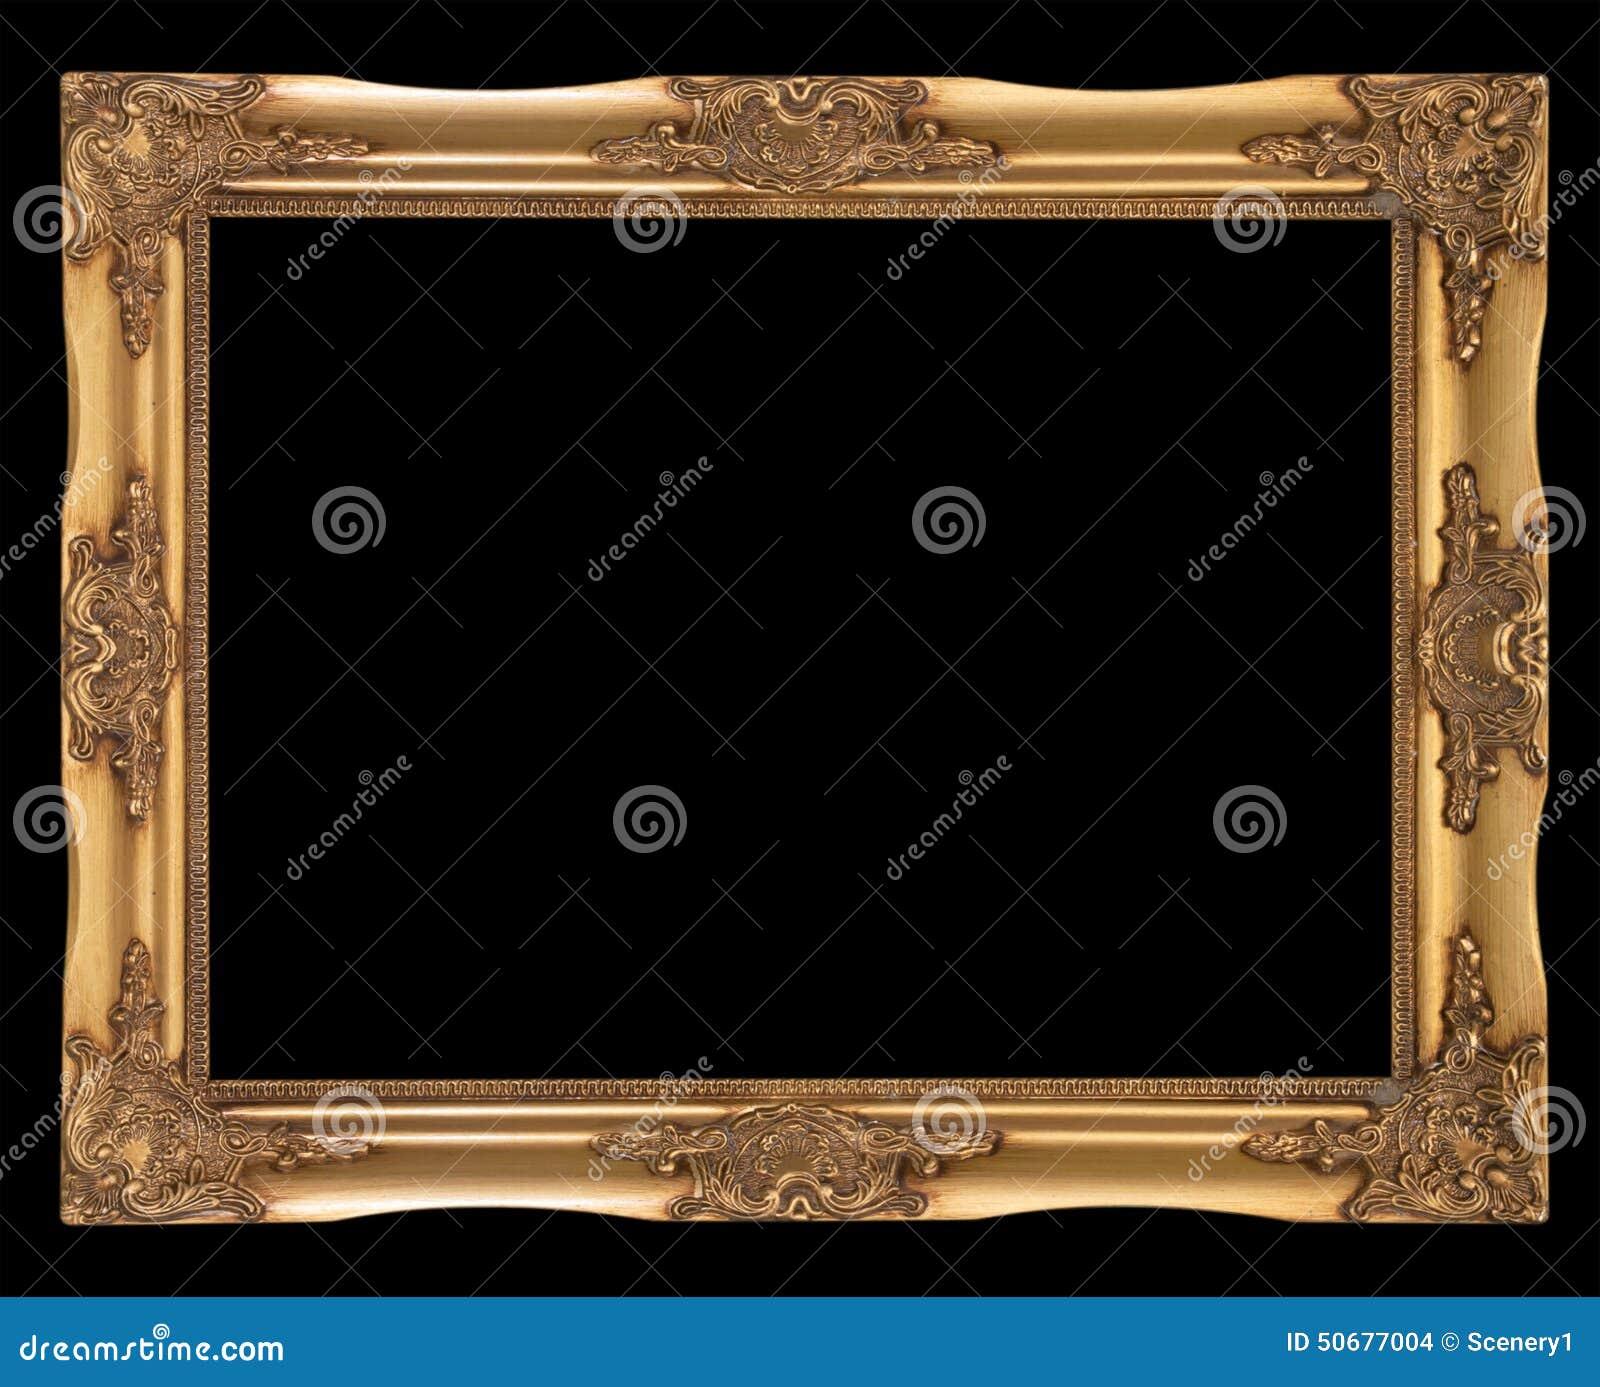 Download 画框 库存照片. 图片 包括有 有席子, 华丽, 装饰, 艺术, 反气旋, 没人, 设备, 图象, 对象 - 50677004